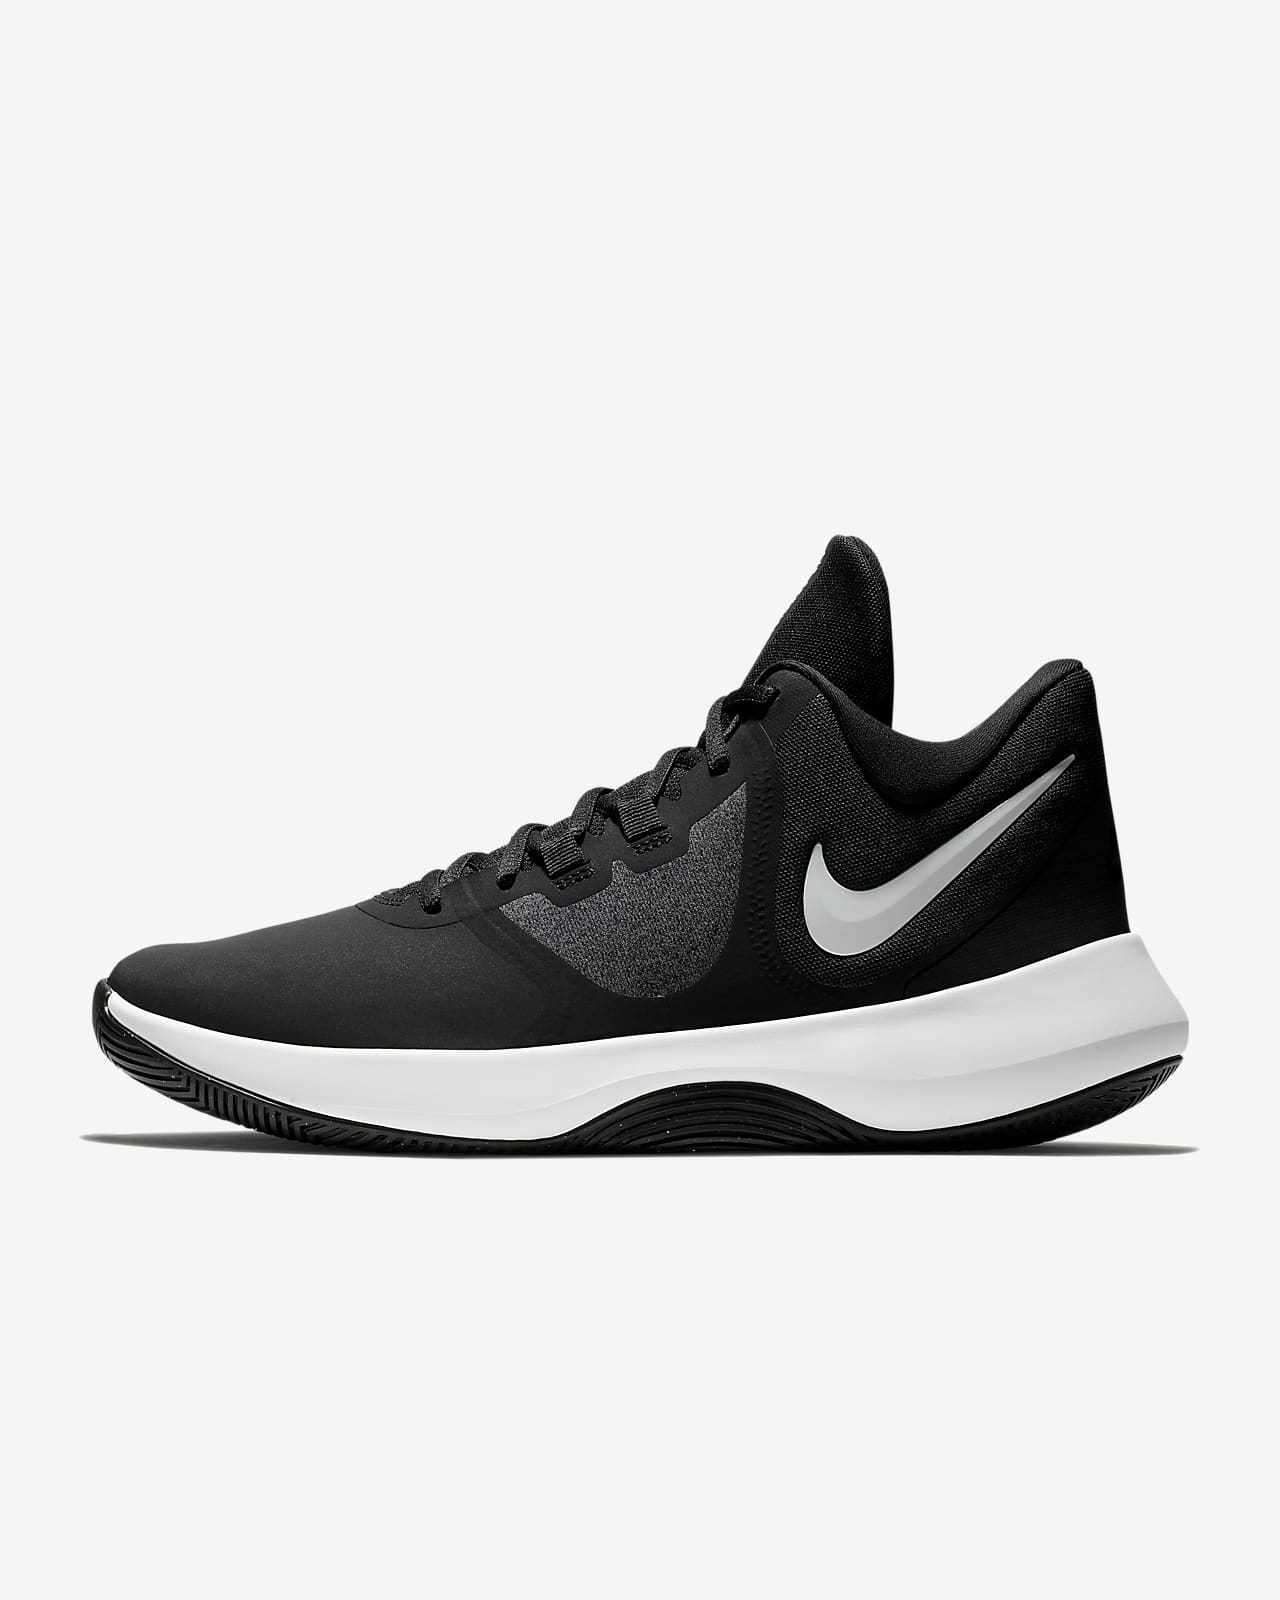 Nike Air Precision 2 NBK Men's Basketball Shoe